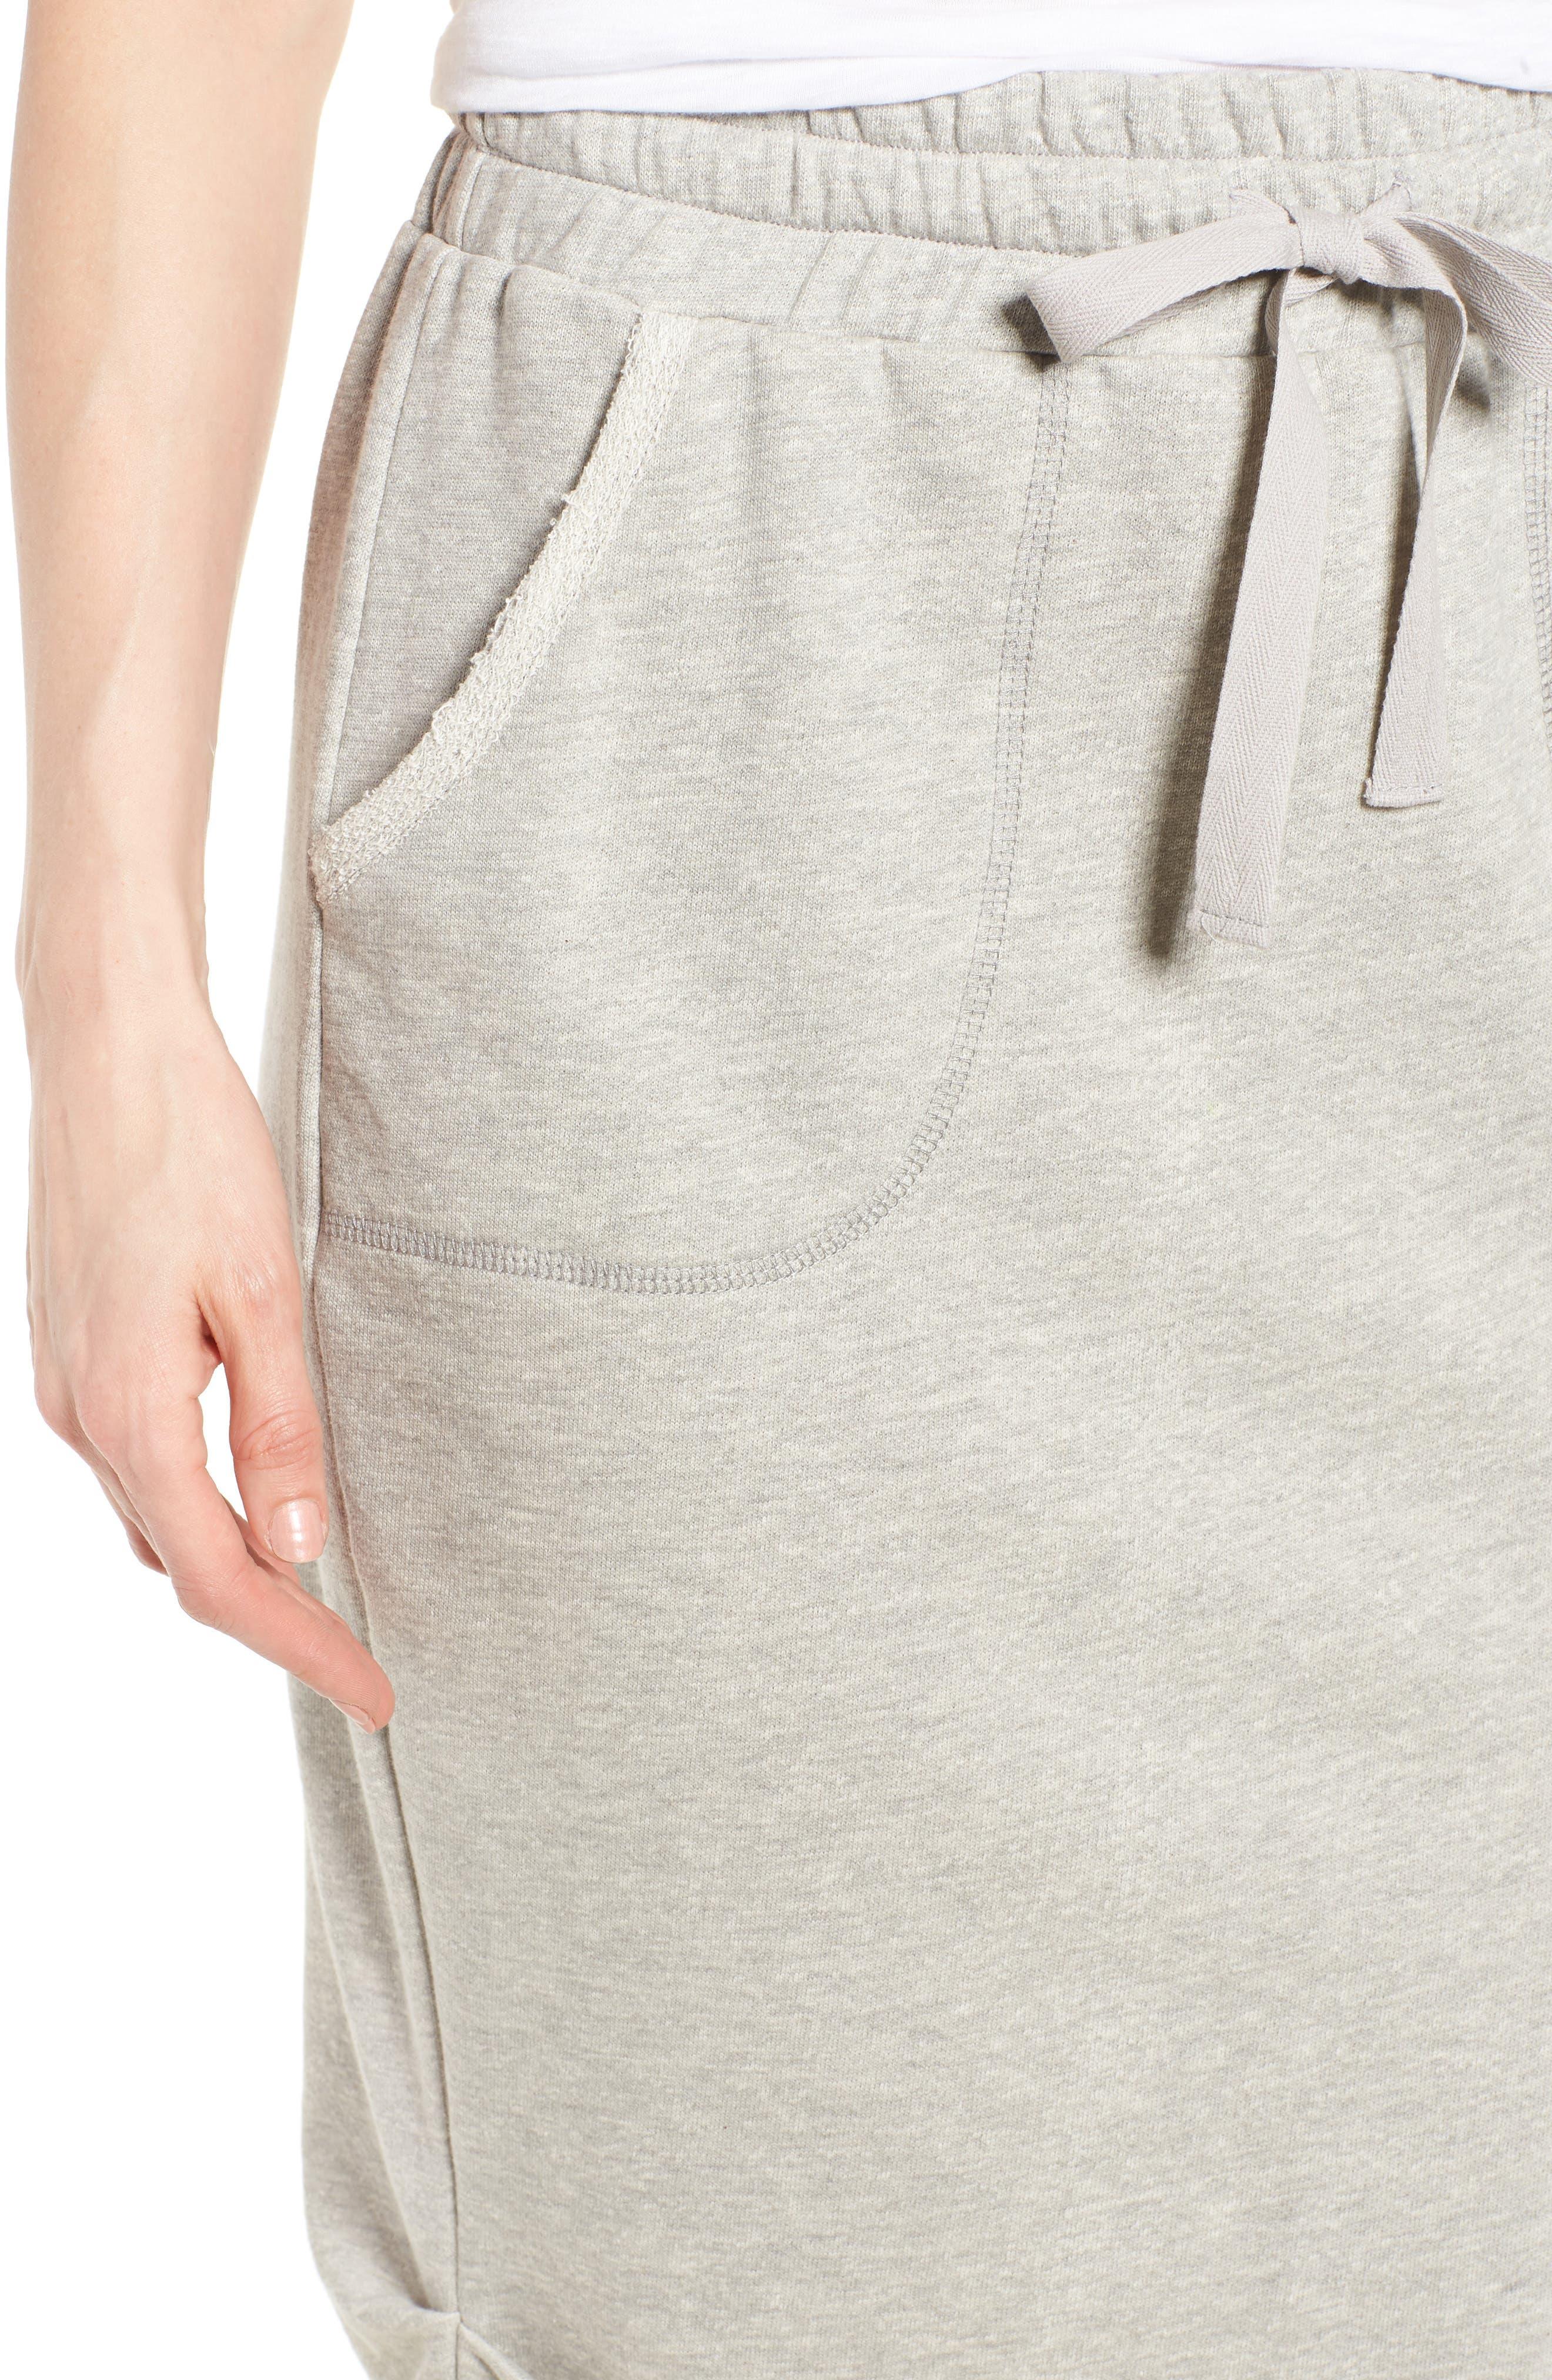 Off-Duty Cotton Knit Drawstring Skirt,                             Alternate thumbnail 4, color,